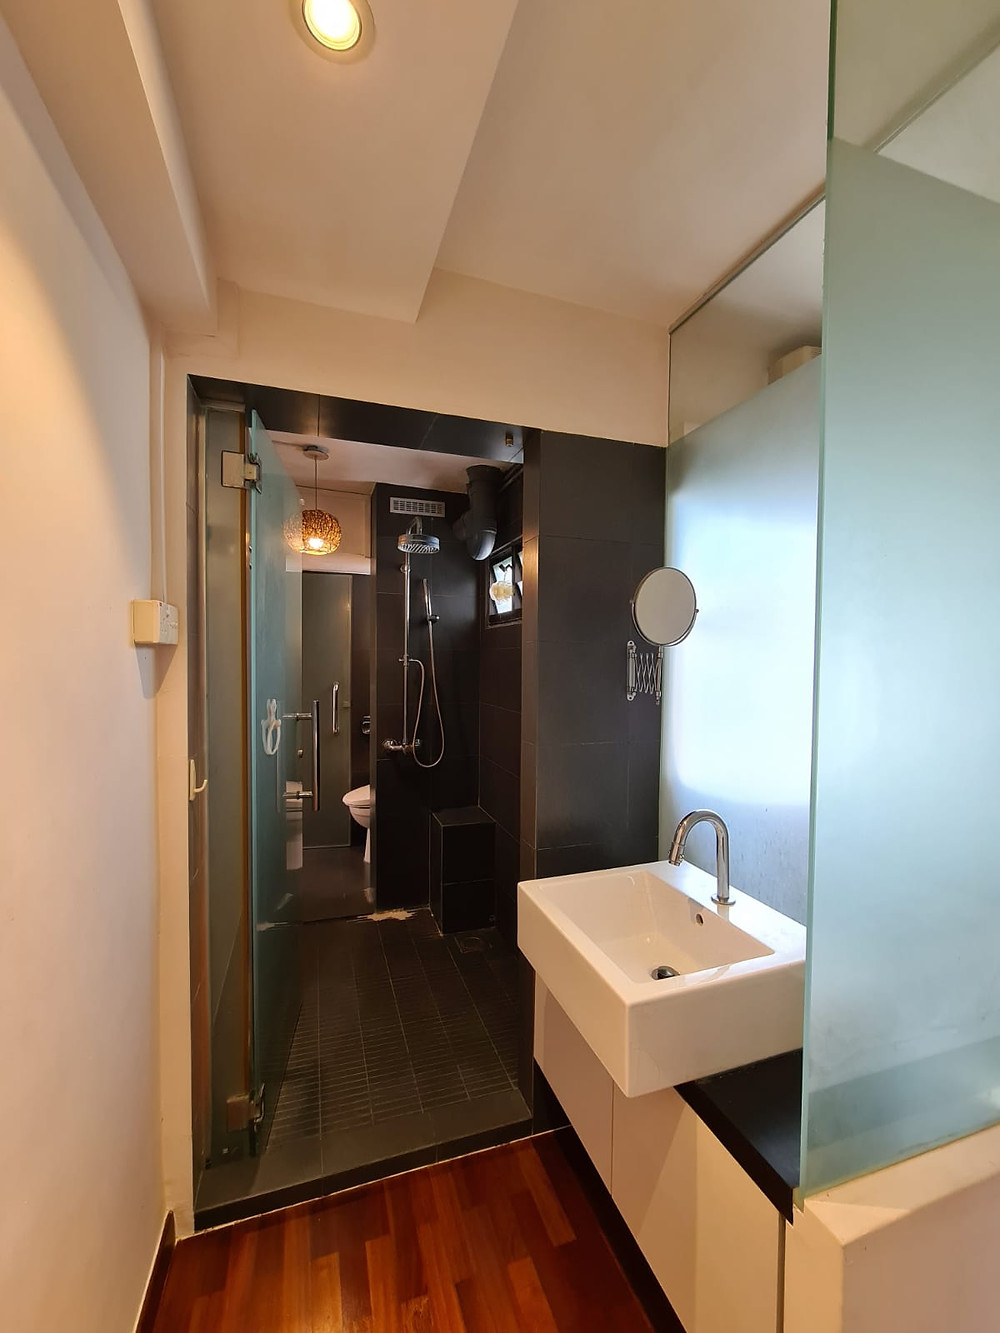 attached bathroom, improved unit, 3I, buy marine parade hdb flat